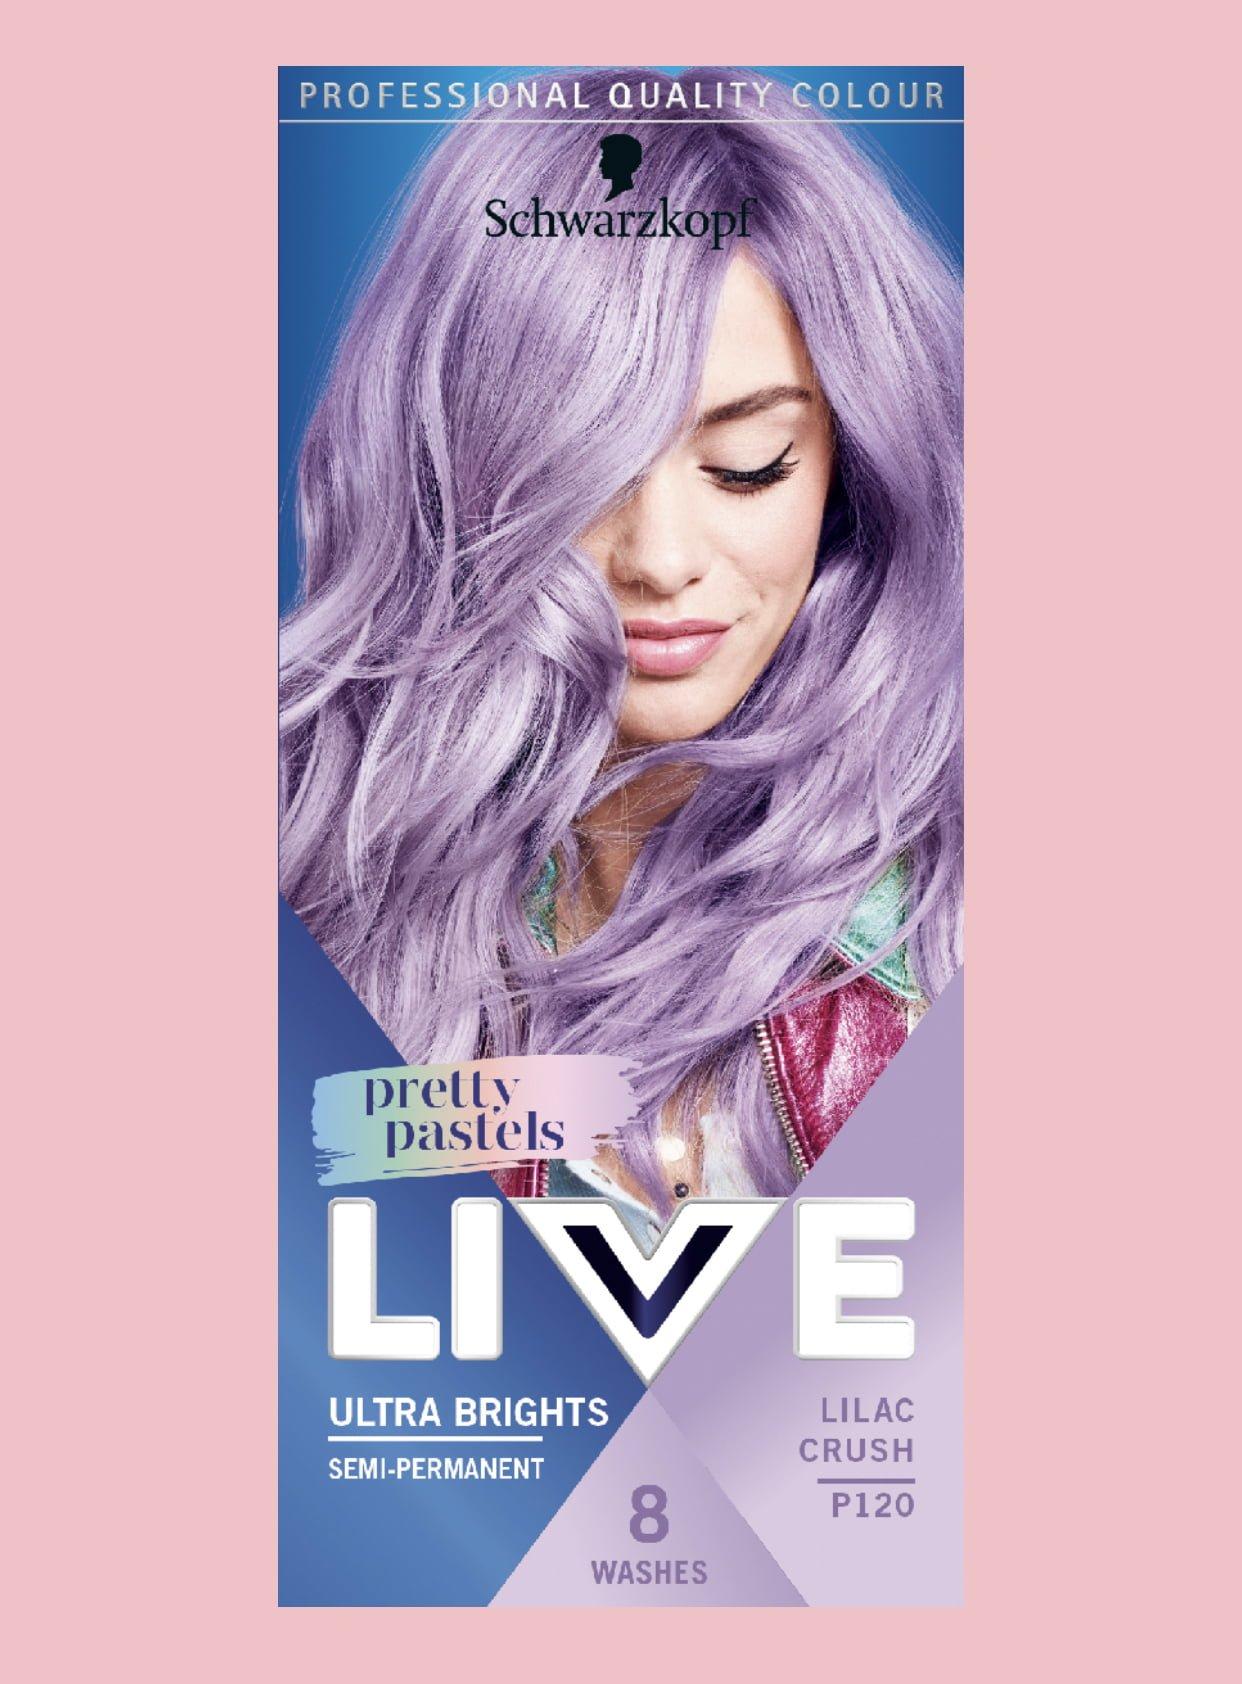 Schwarzkopf Live Pretty Pastels Collection 1